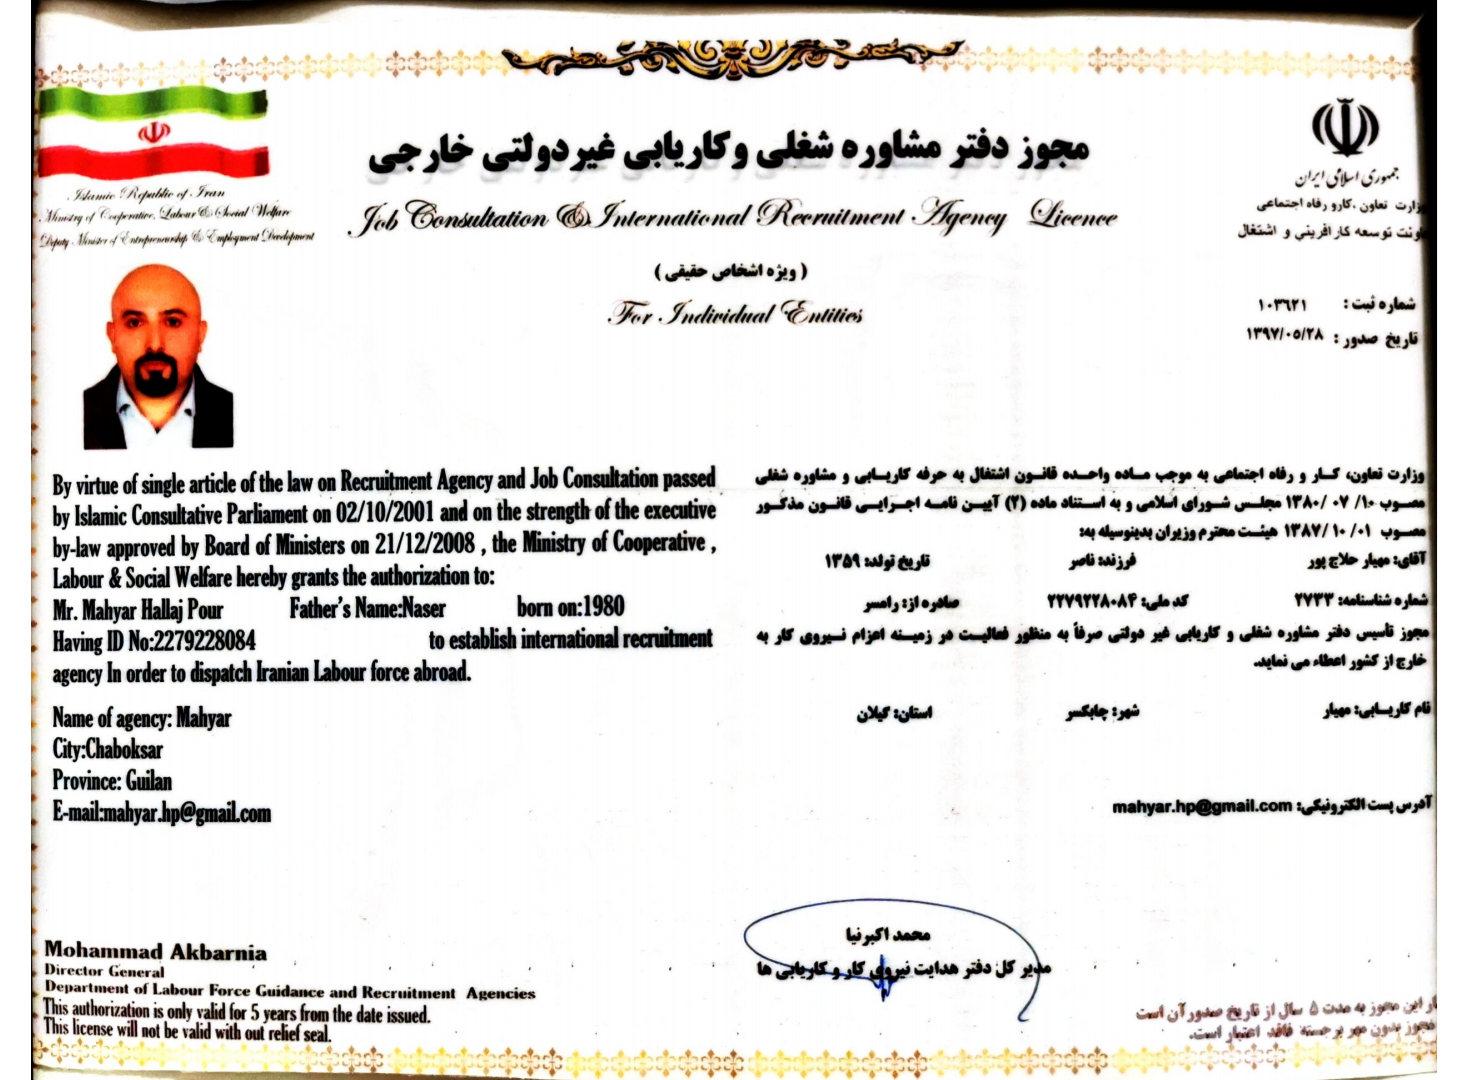 مجوز-کاریابی-مهیار-حلاج-پور-ویزا-724